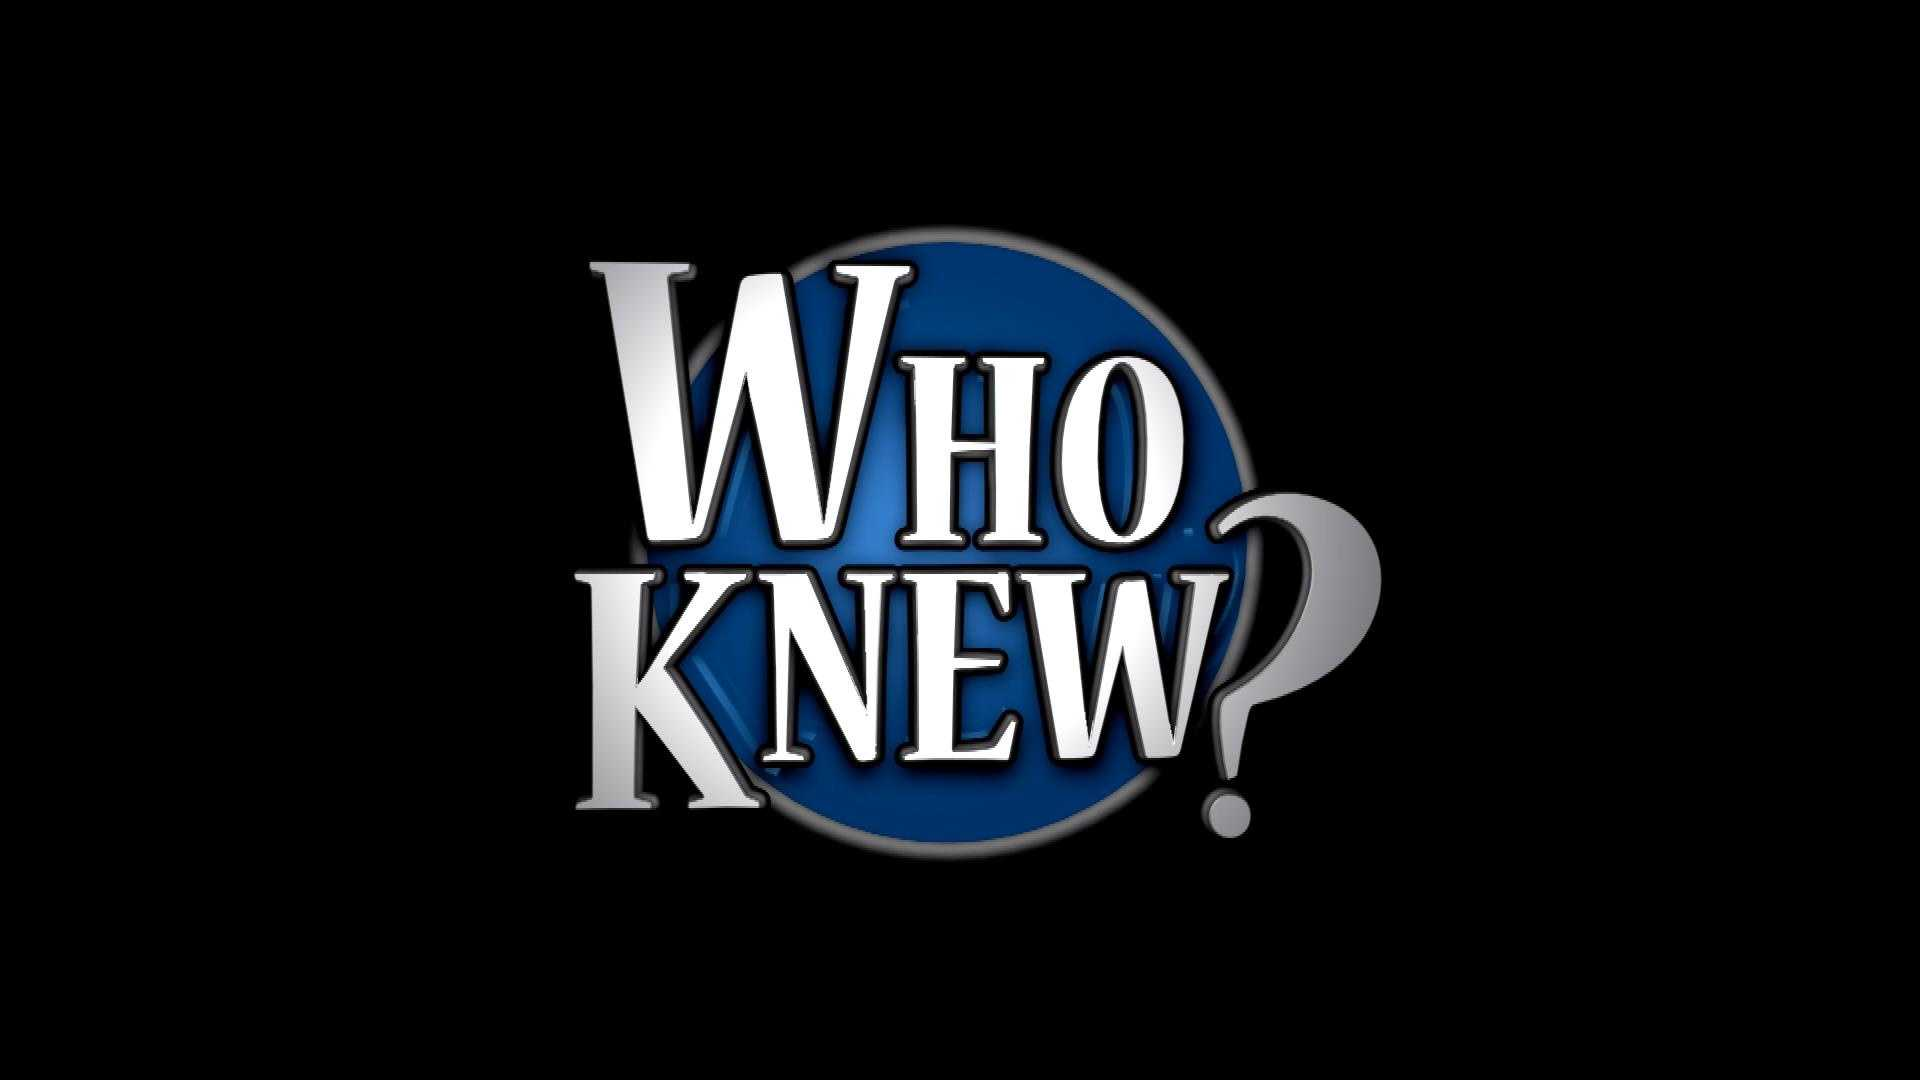 Tuesday, February 18: Who Knew?